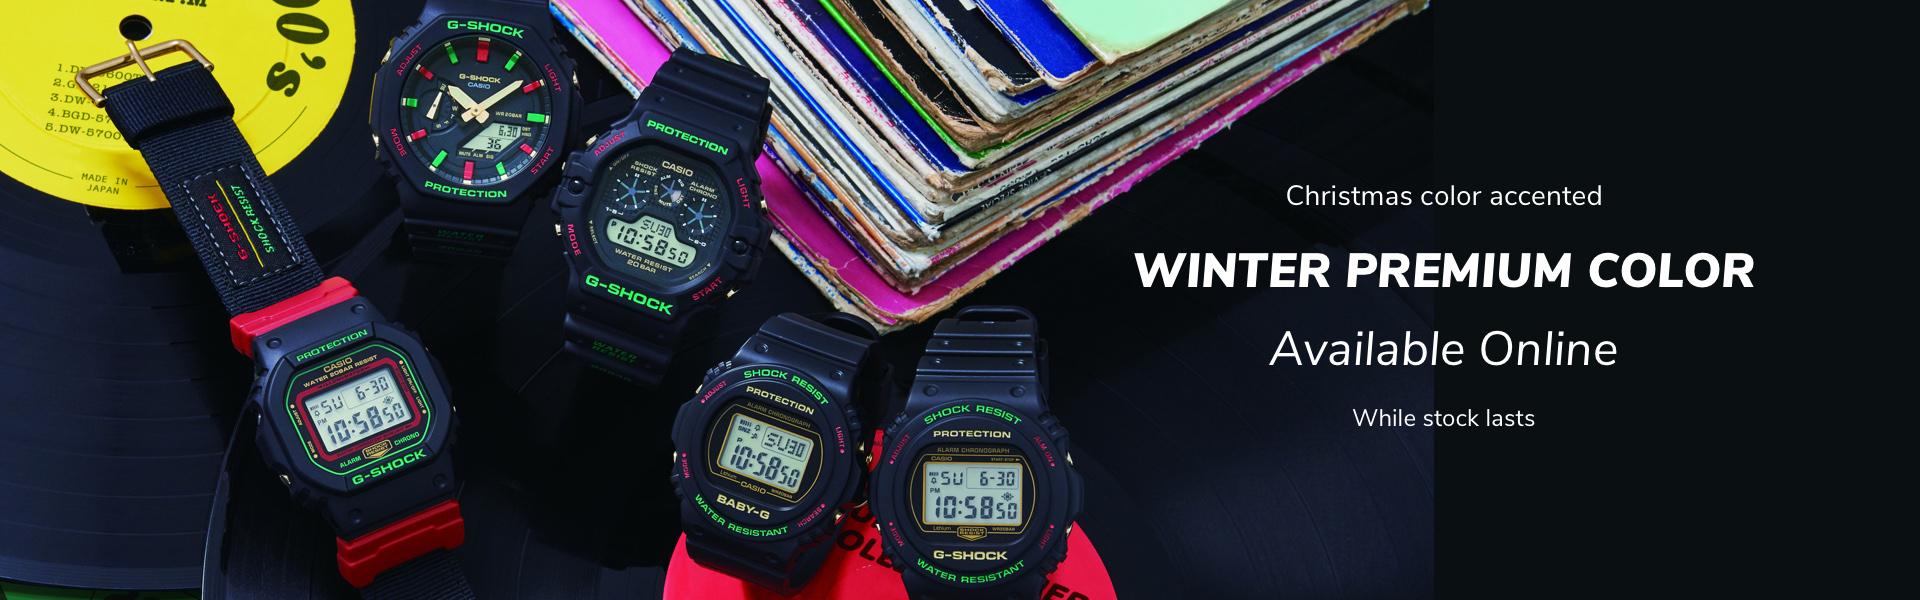 2019 Christmas - Winter Premium Color